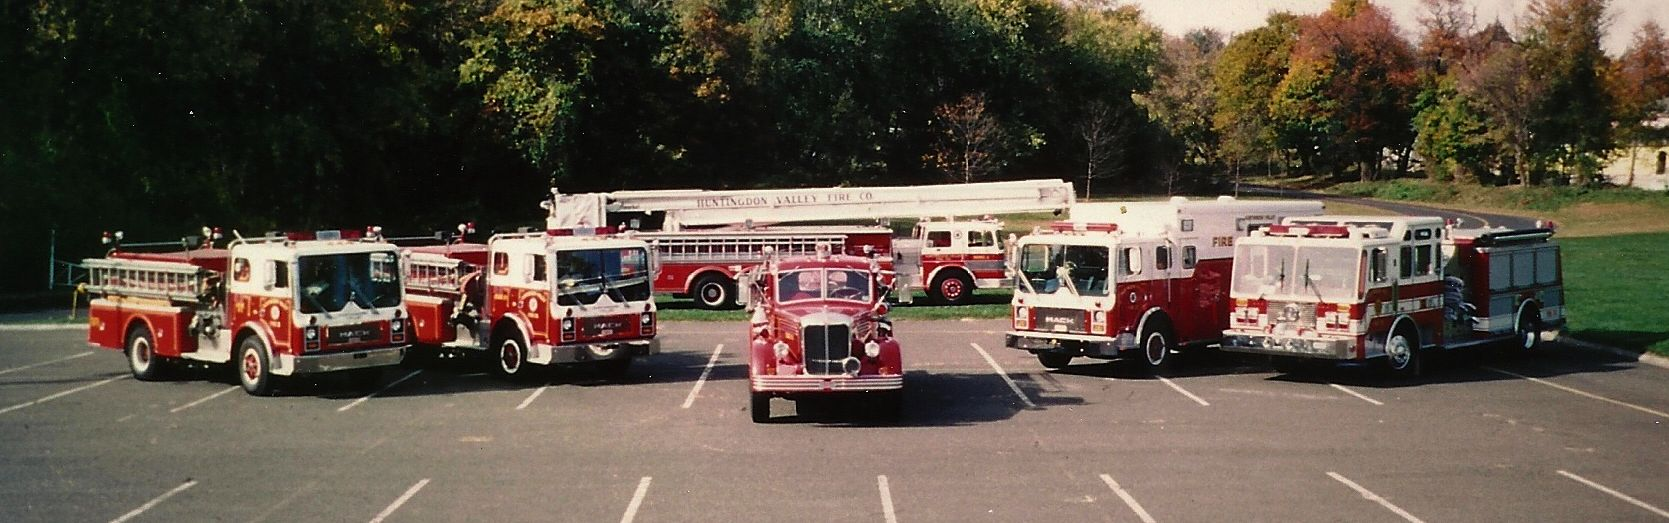 Station 8 Fleet - 1998